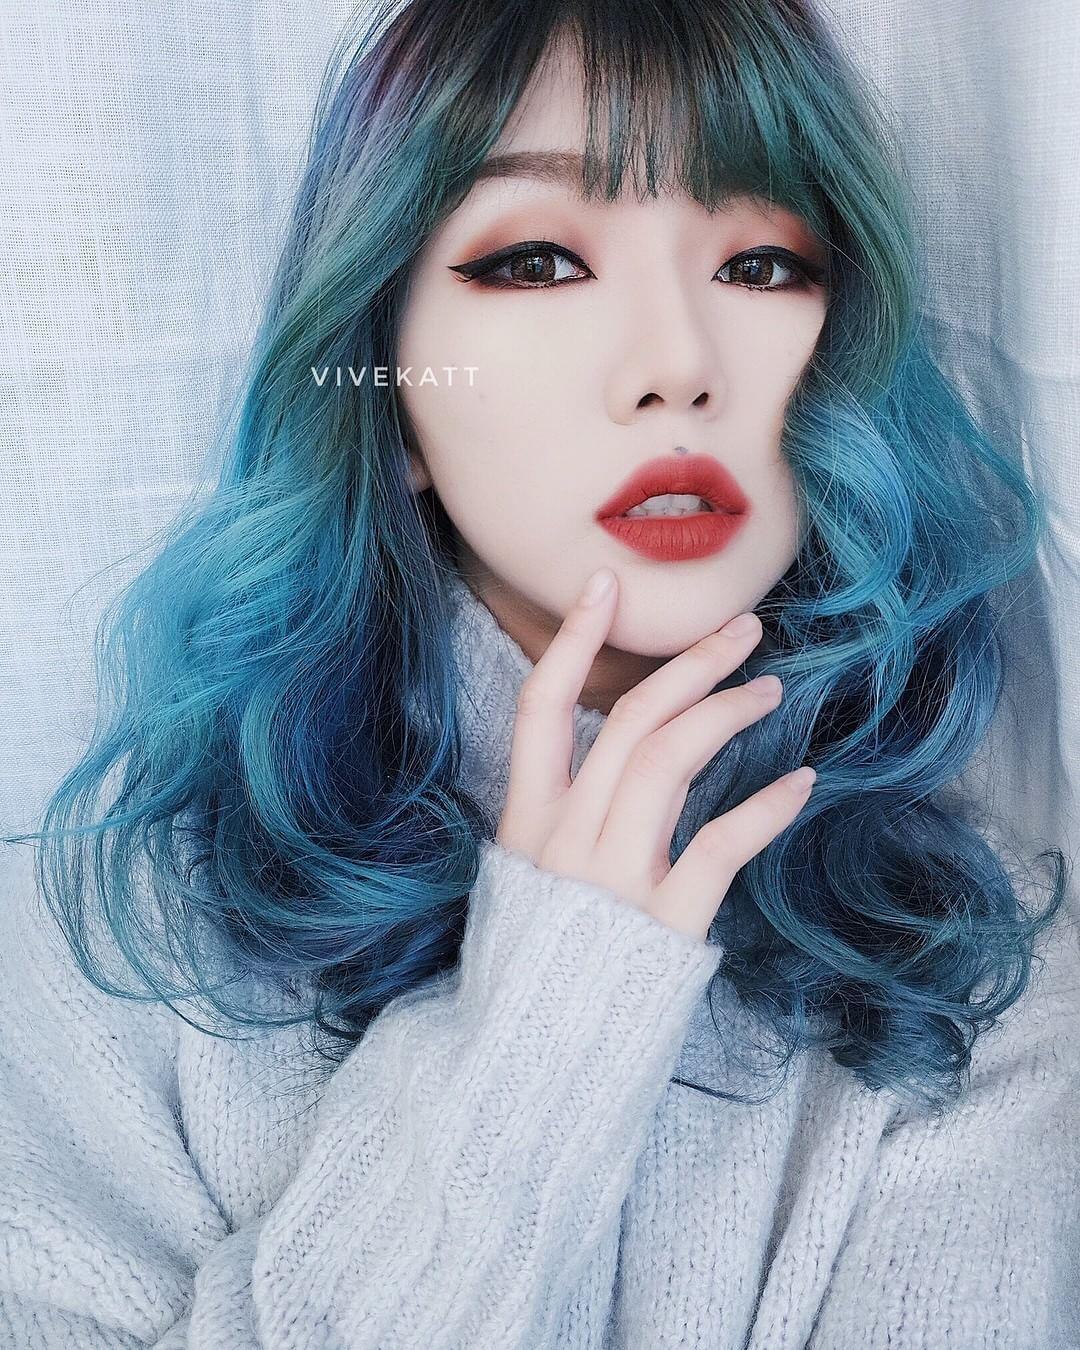 Korean girl with blue hair